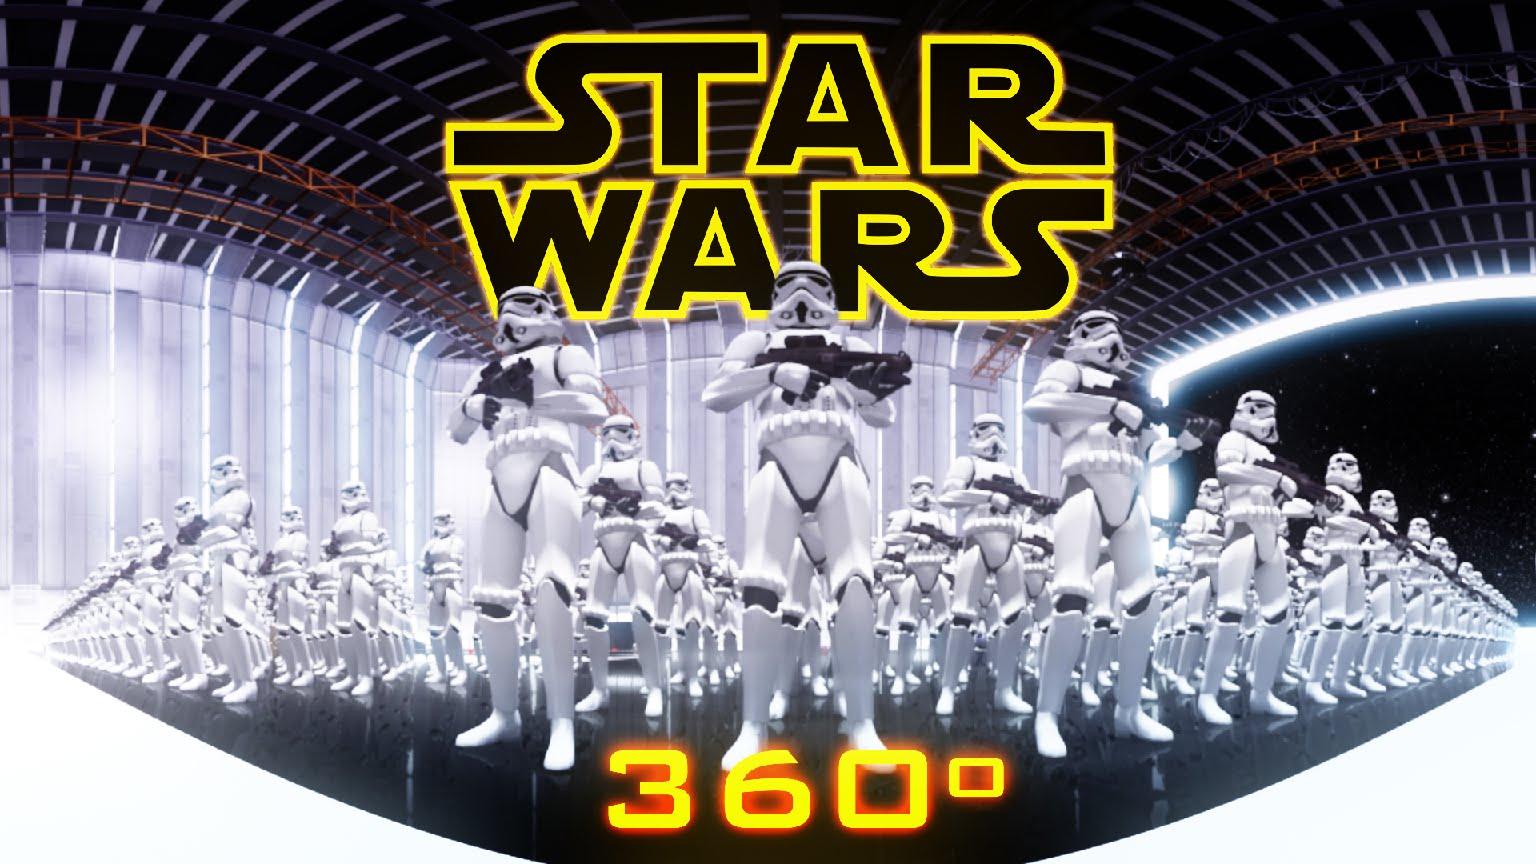 Star Wars 360 Video